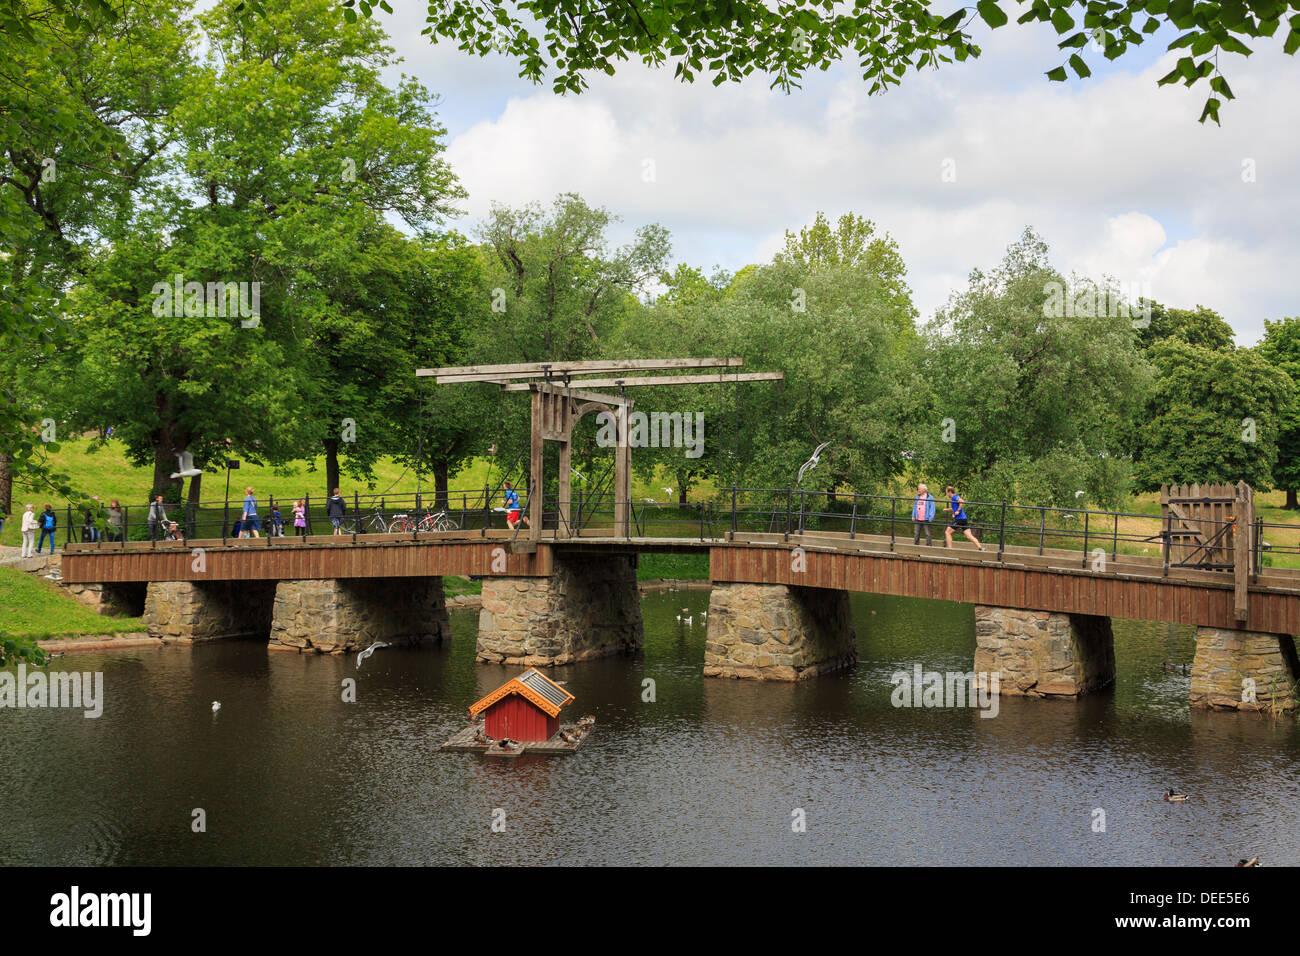 Old wooden drawbridge across the moat around old fortified town of Gamlebyen, Fredrikstad, Ostfold, Norway, Scandinavia - Stock Image